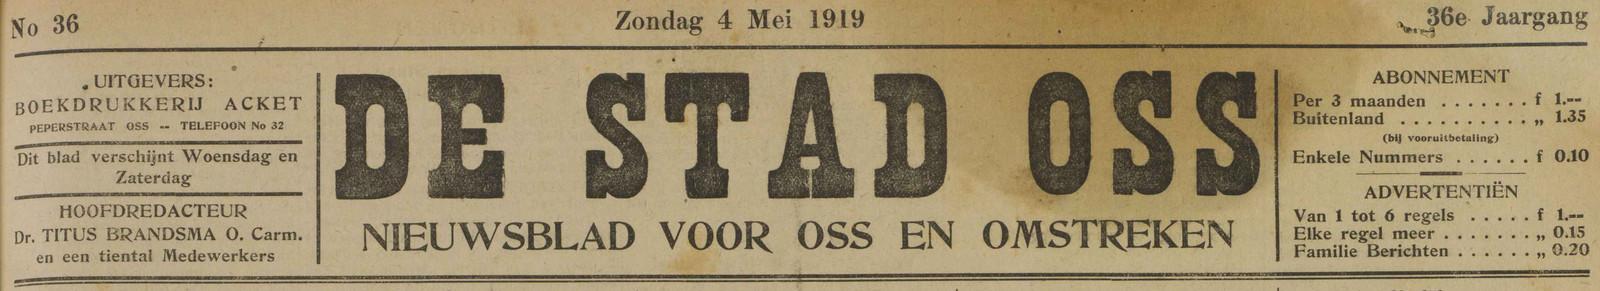 De eerste krant die Titus Brandsma op 1919 als hoofdredacteur afleverde.